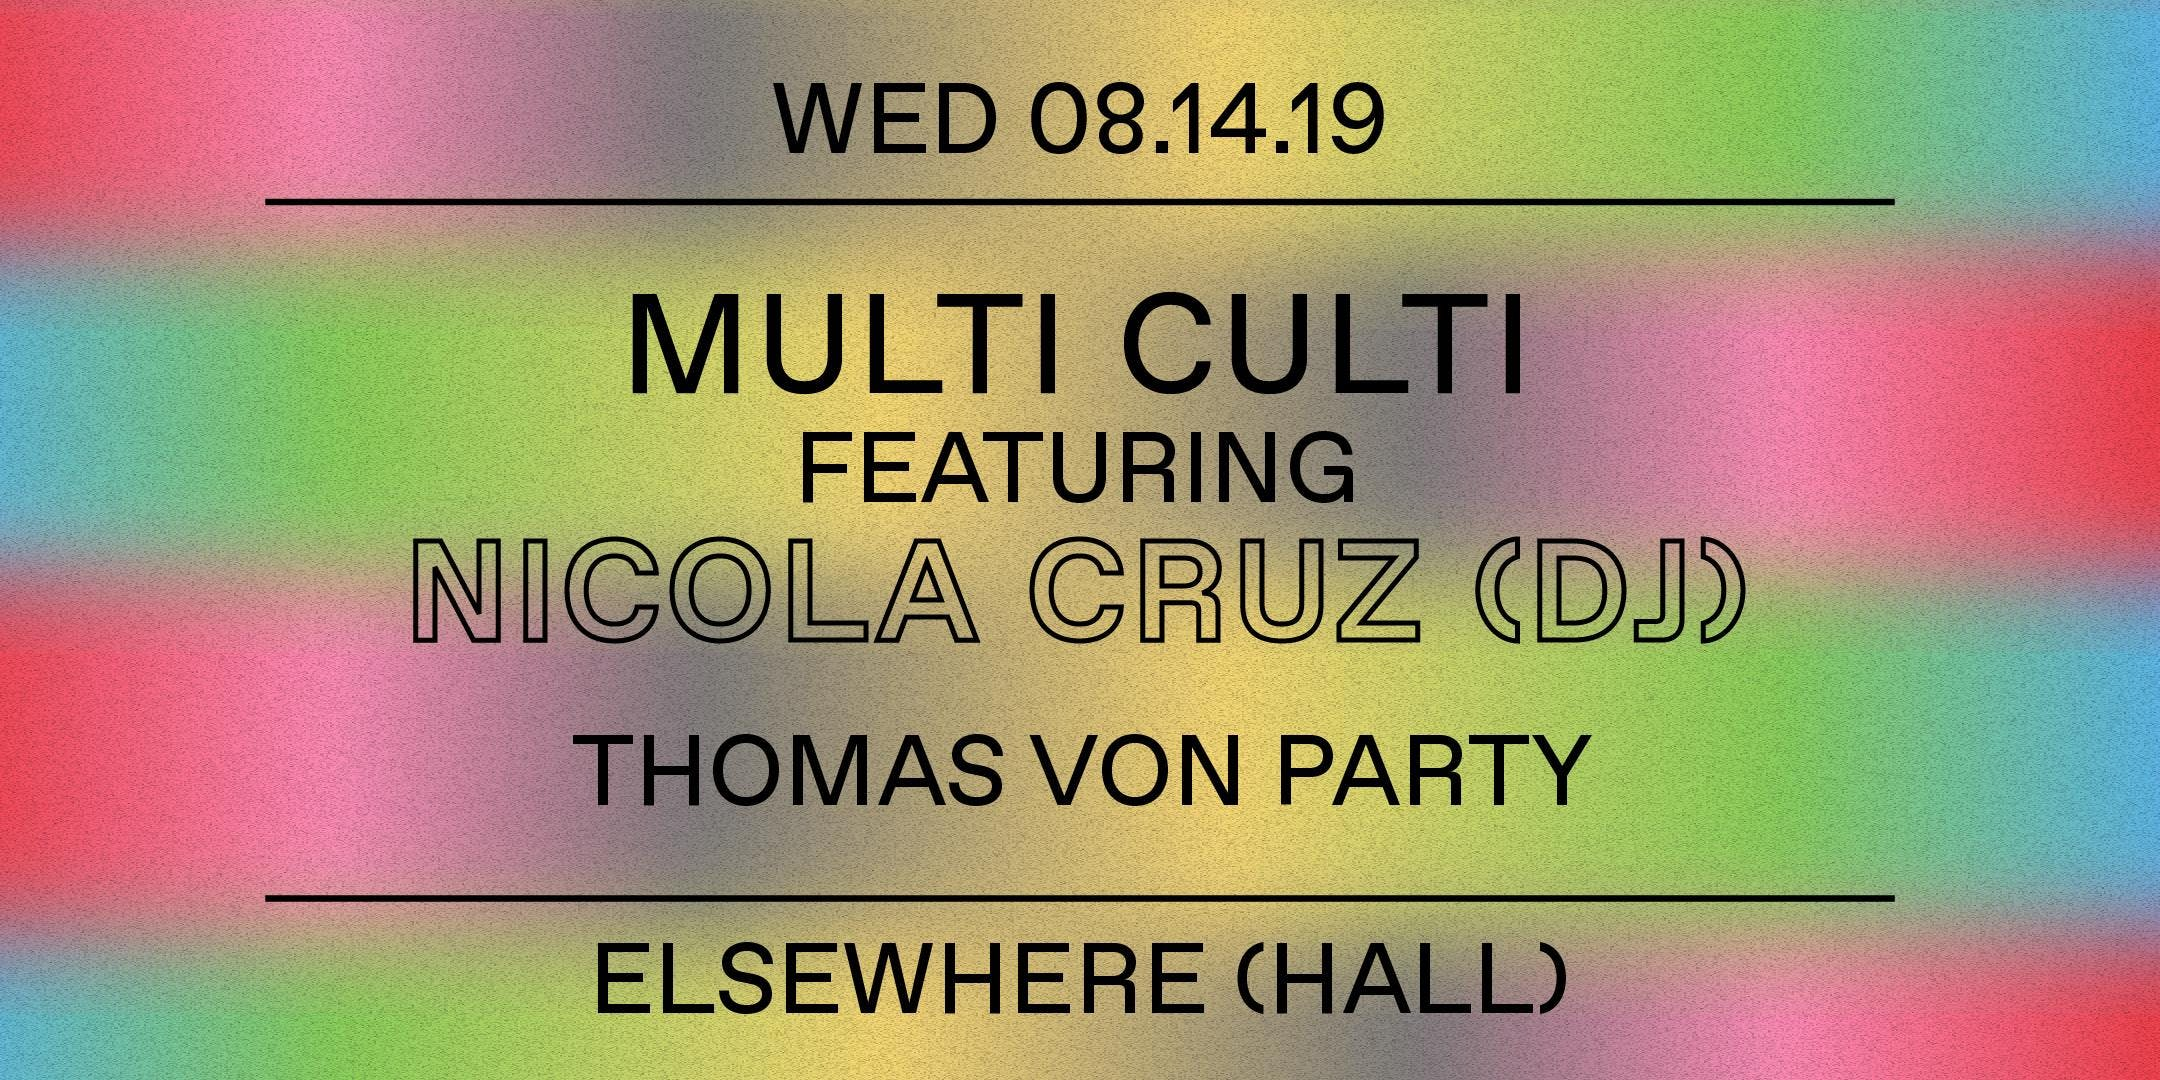 NICOLA CRUZ (DJ SET), Thomas Von Party (Multi Culti Party)